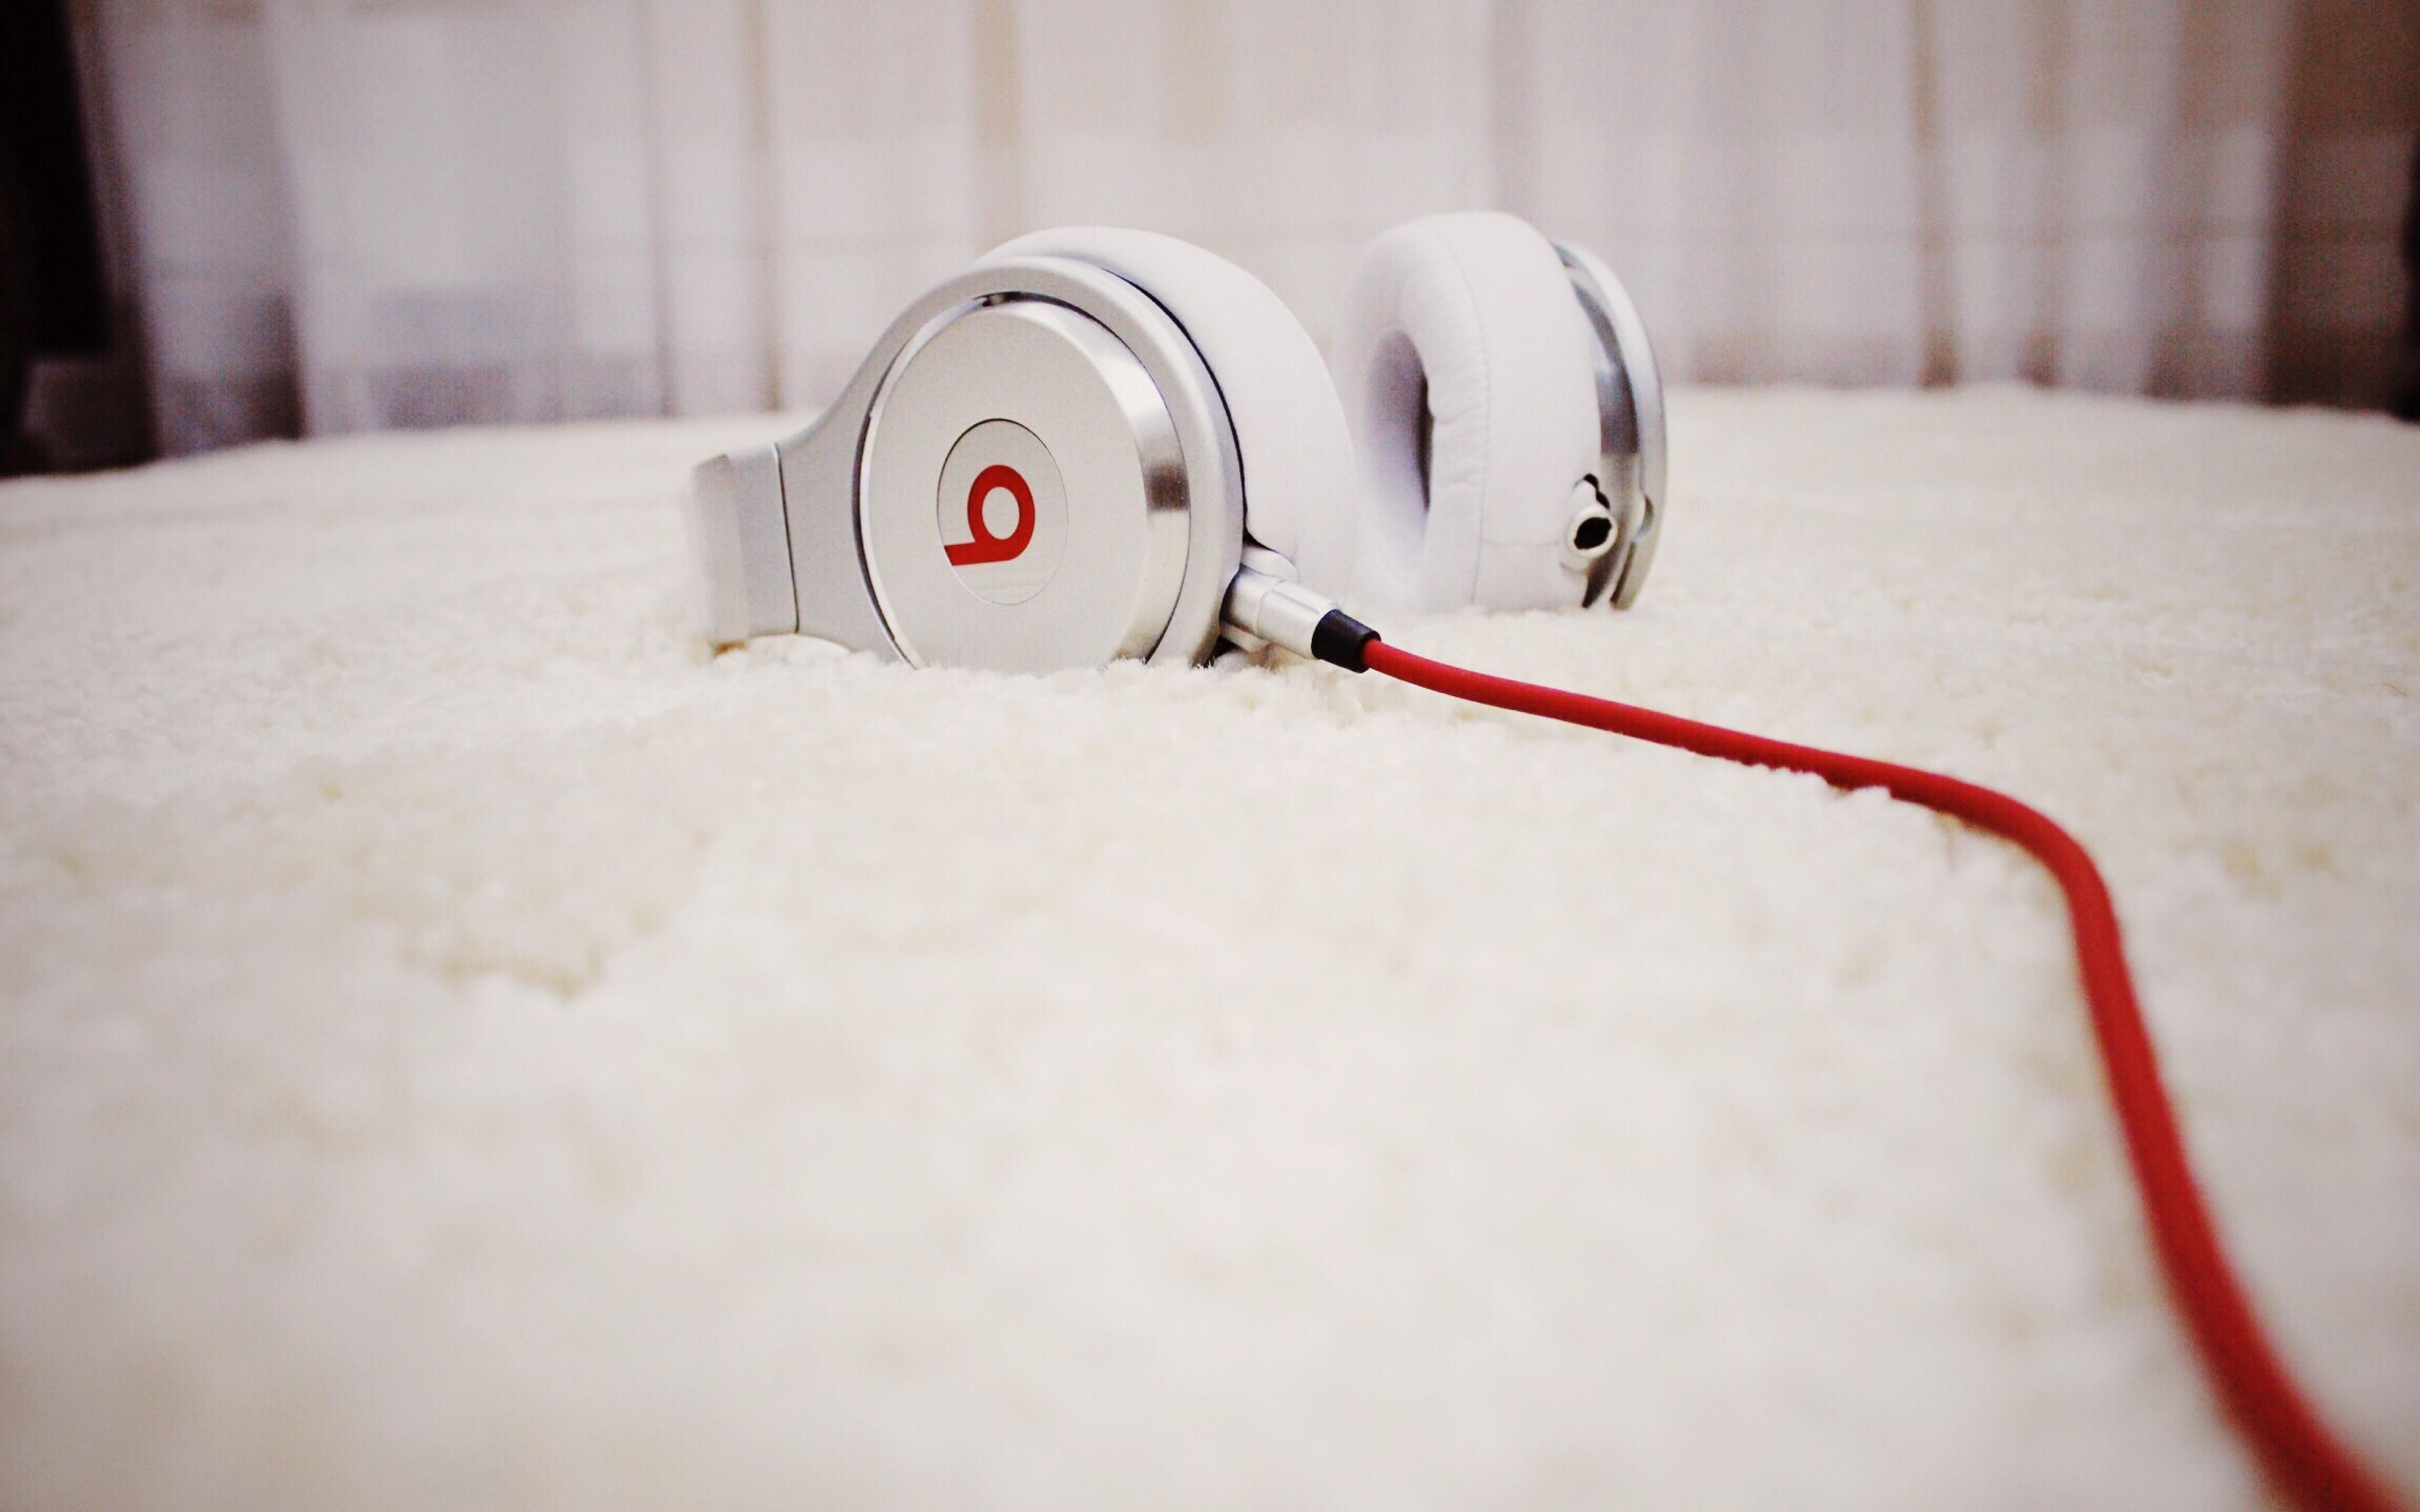 white beats audio headphones widescreen wallpaper 62183